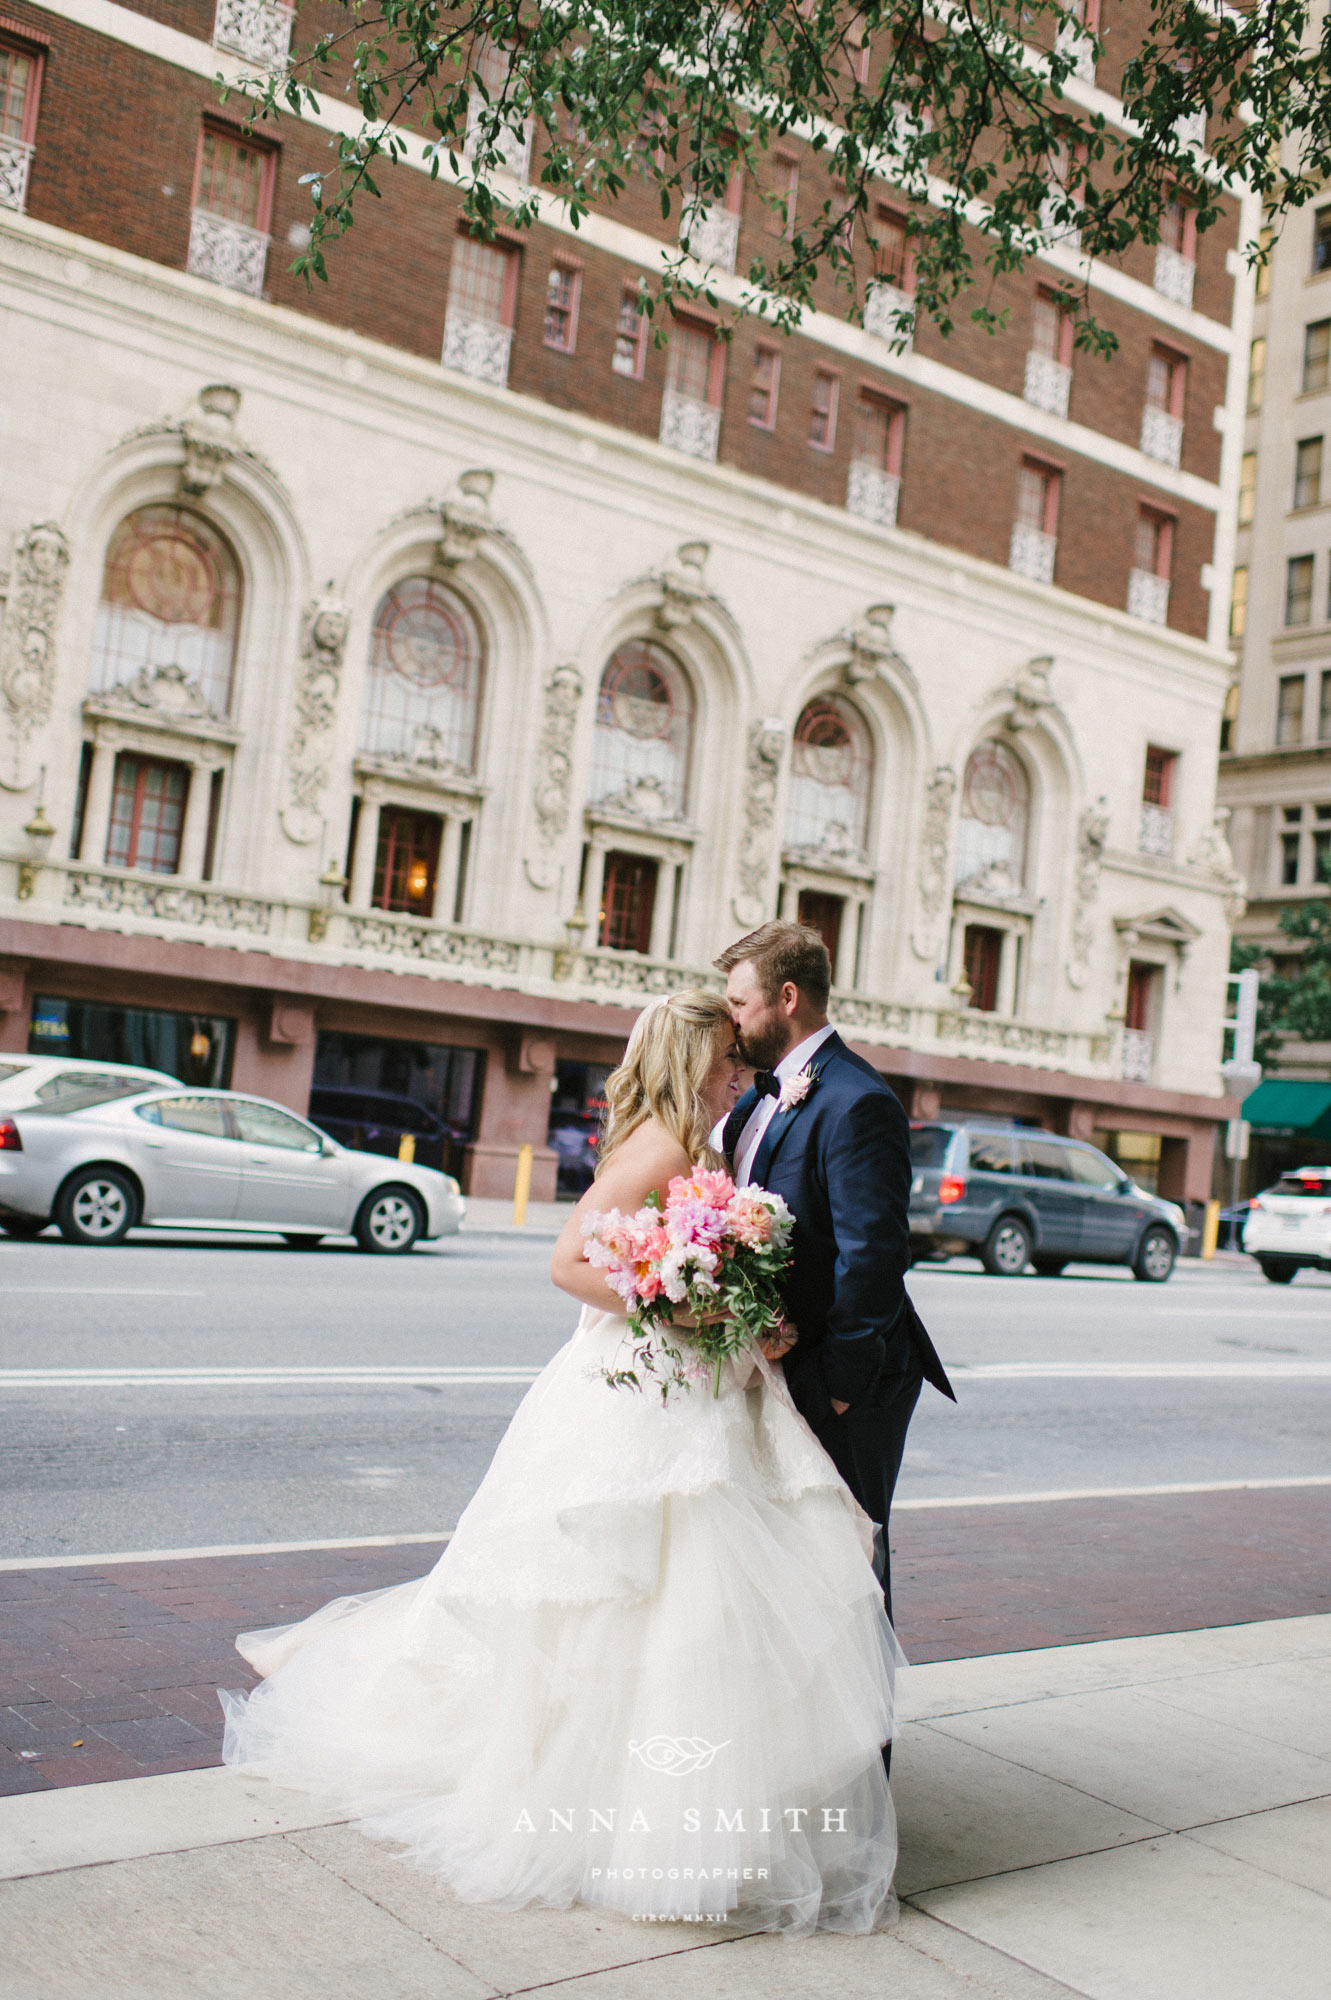 Bride and groom photos in downtown dallas